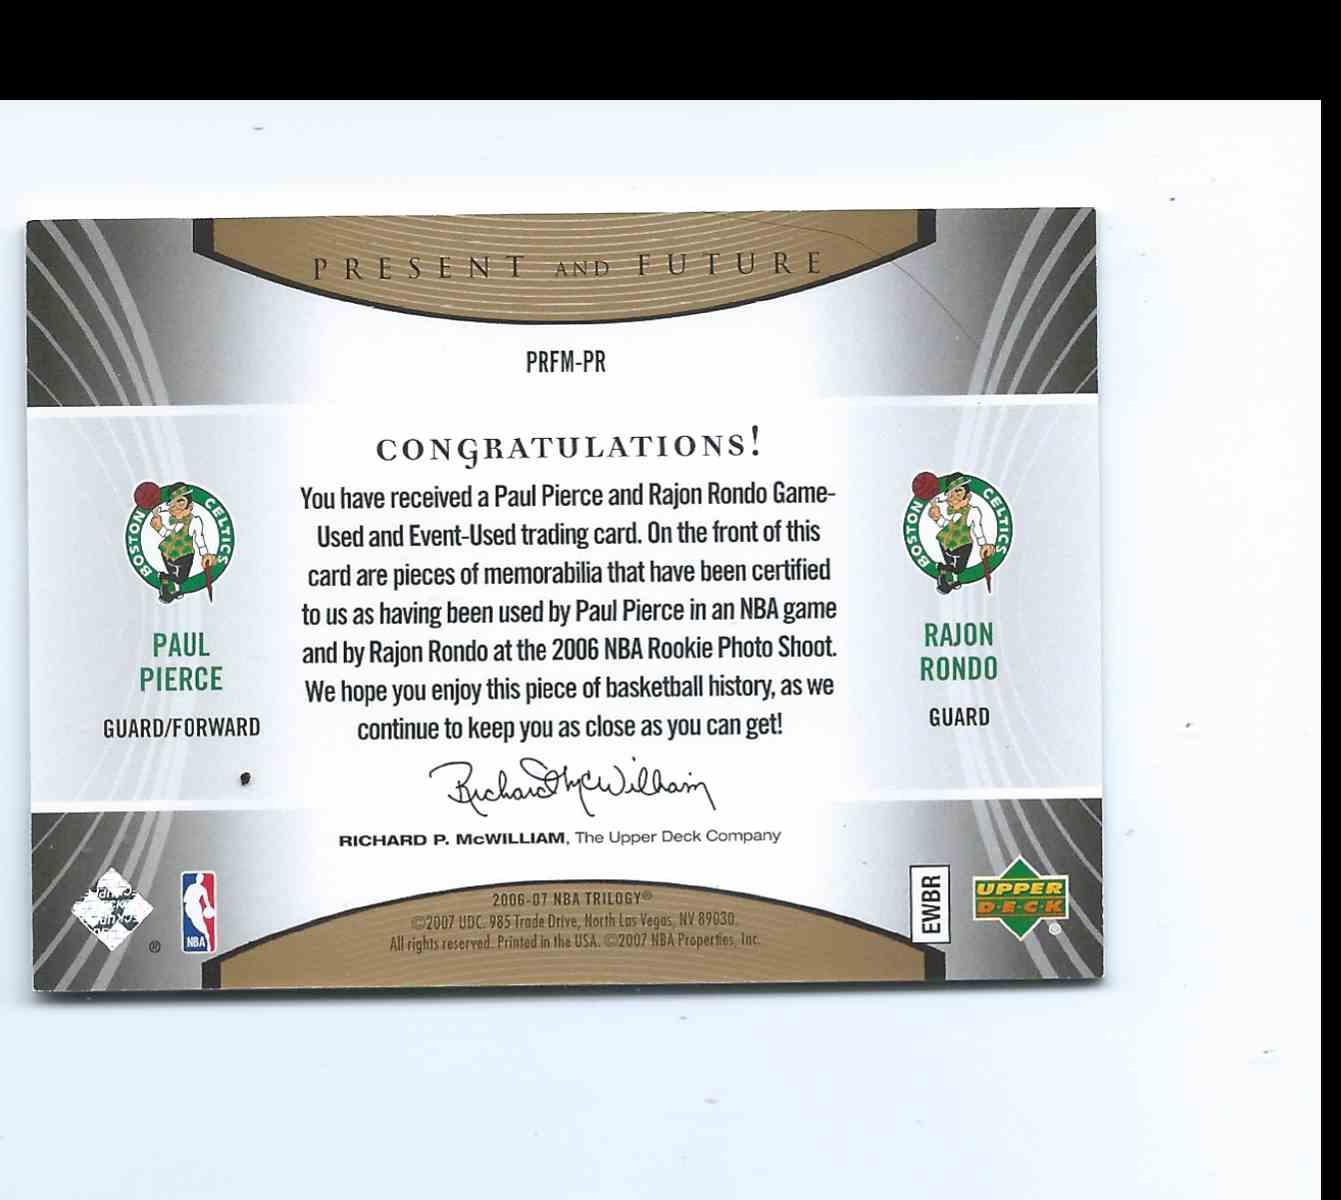 2006-07 Upper Deck Trilogy Generations Present And Future Paul Pierce / Rajon Rondo (Rc) Rookie #PRFM-PR card back image